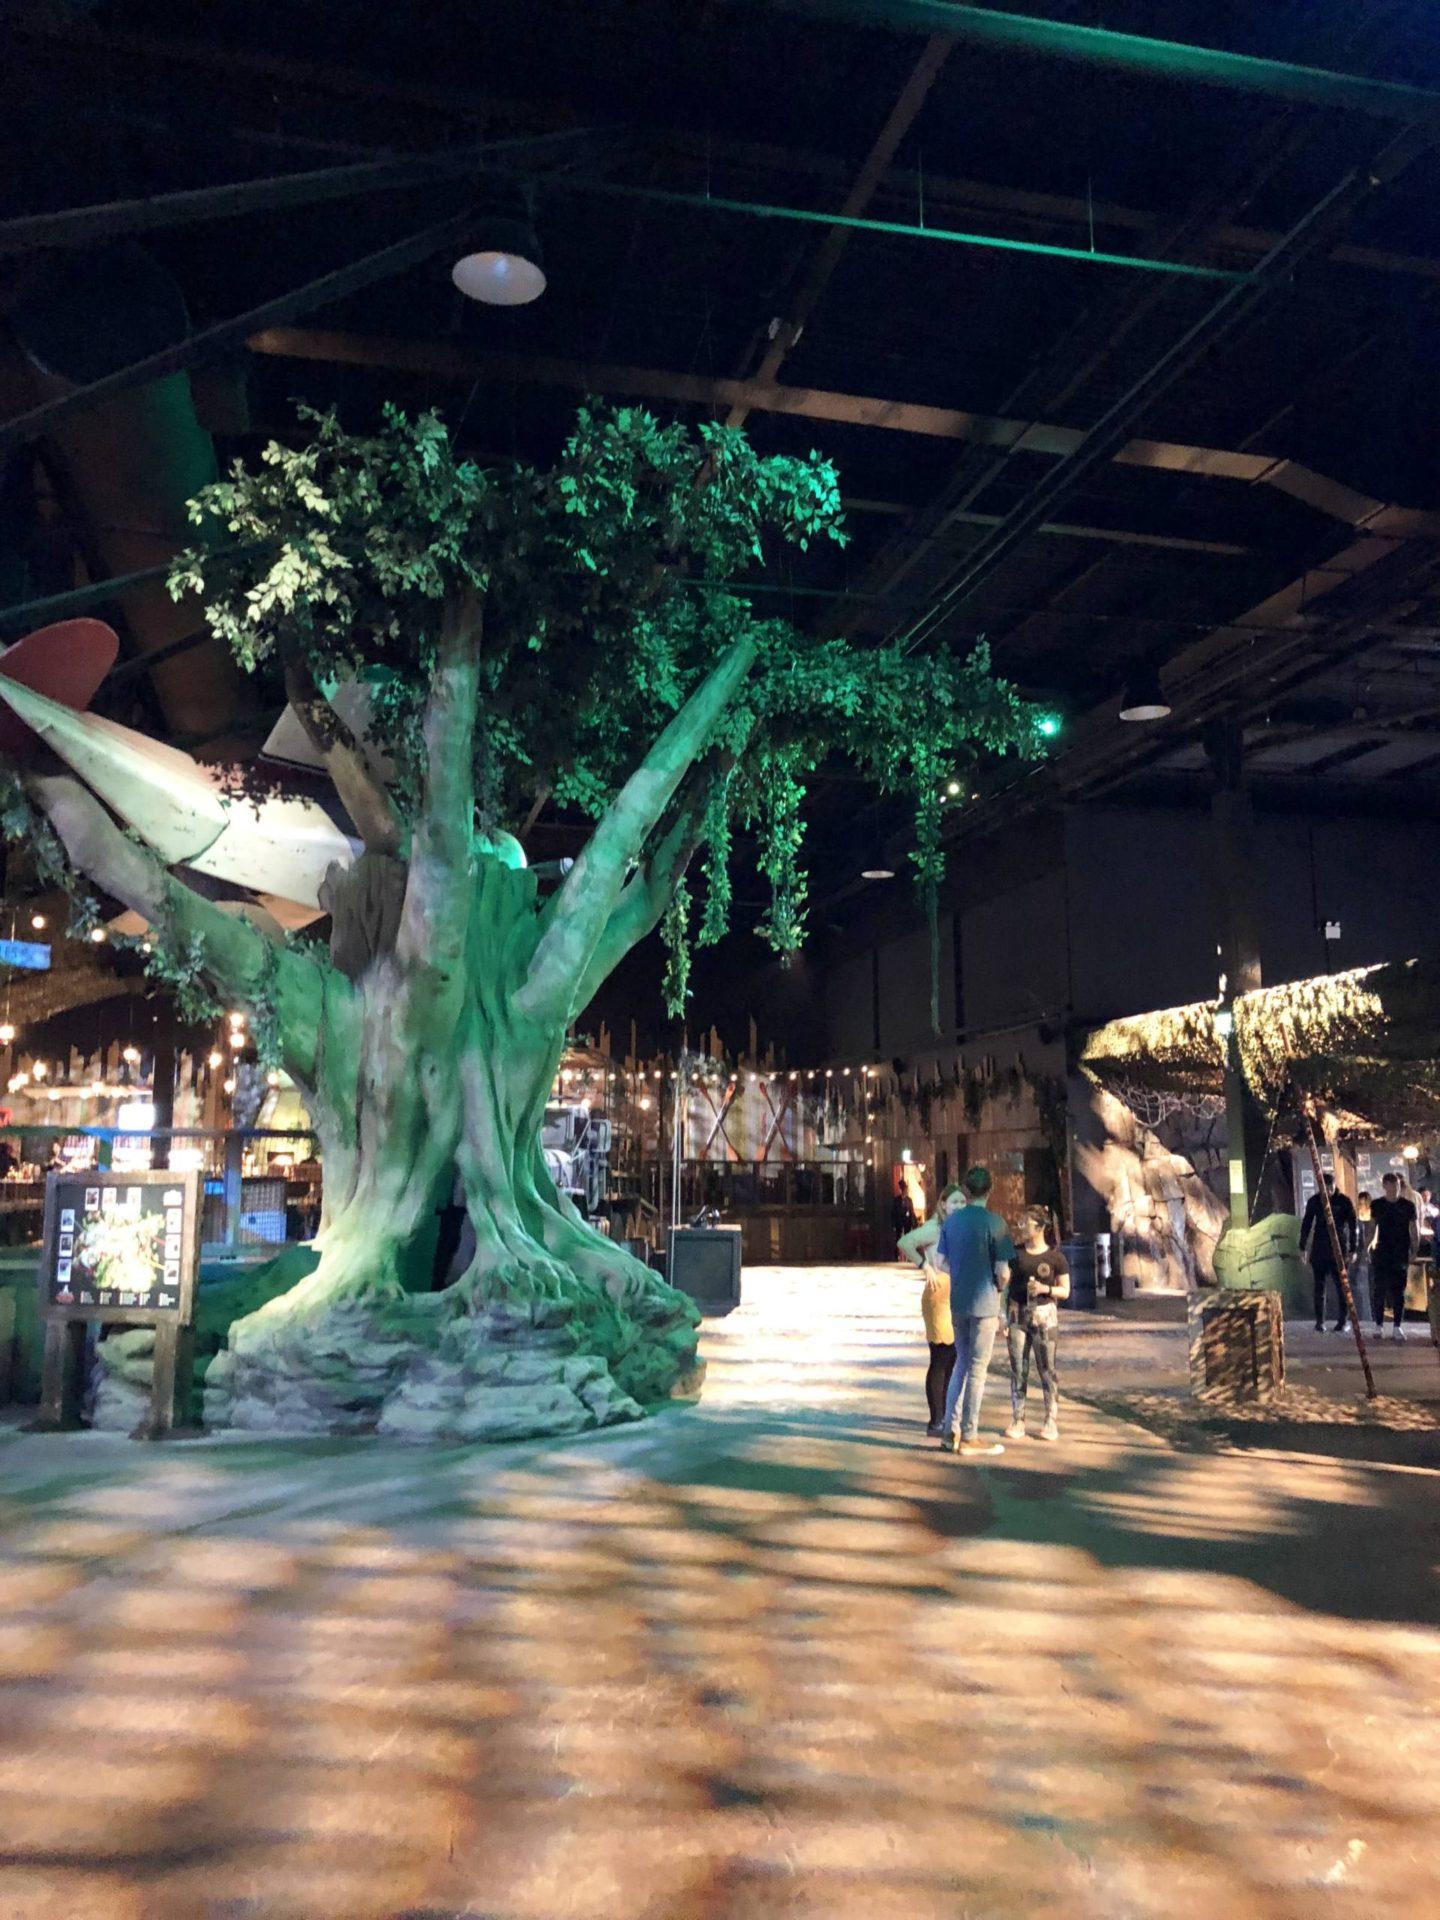 Bear Grylls Attraction Birmingham NEC tree